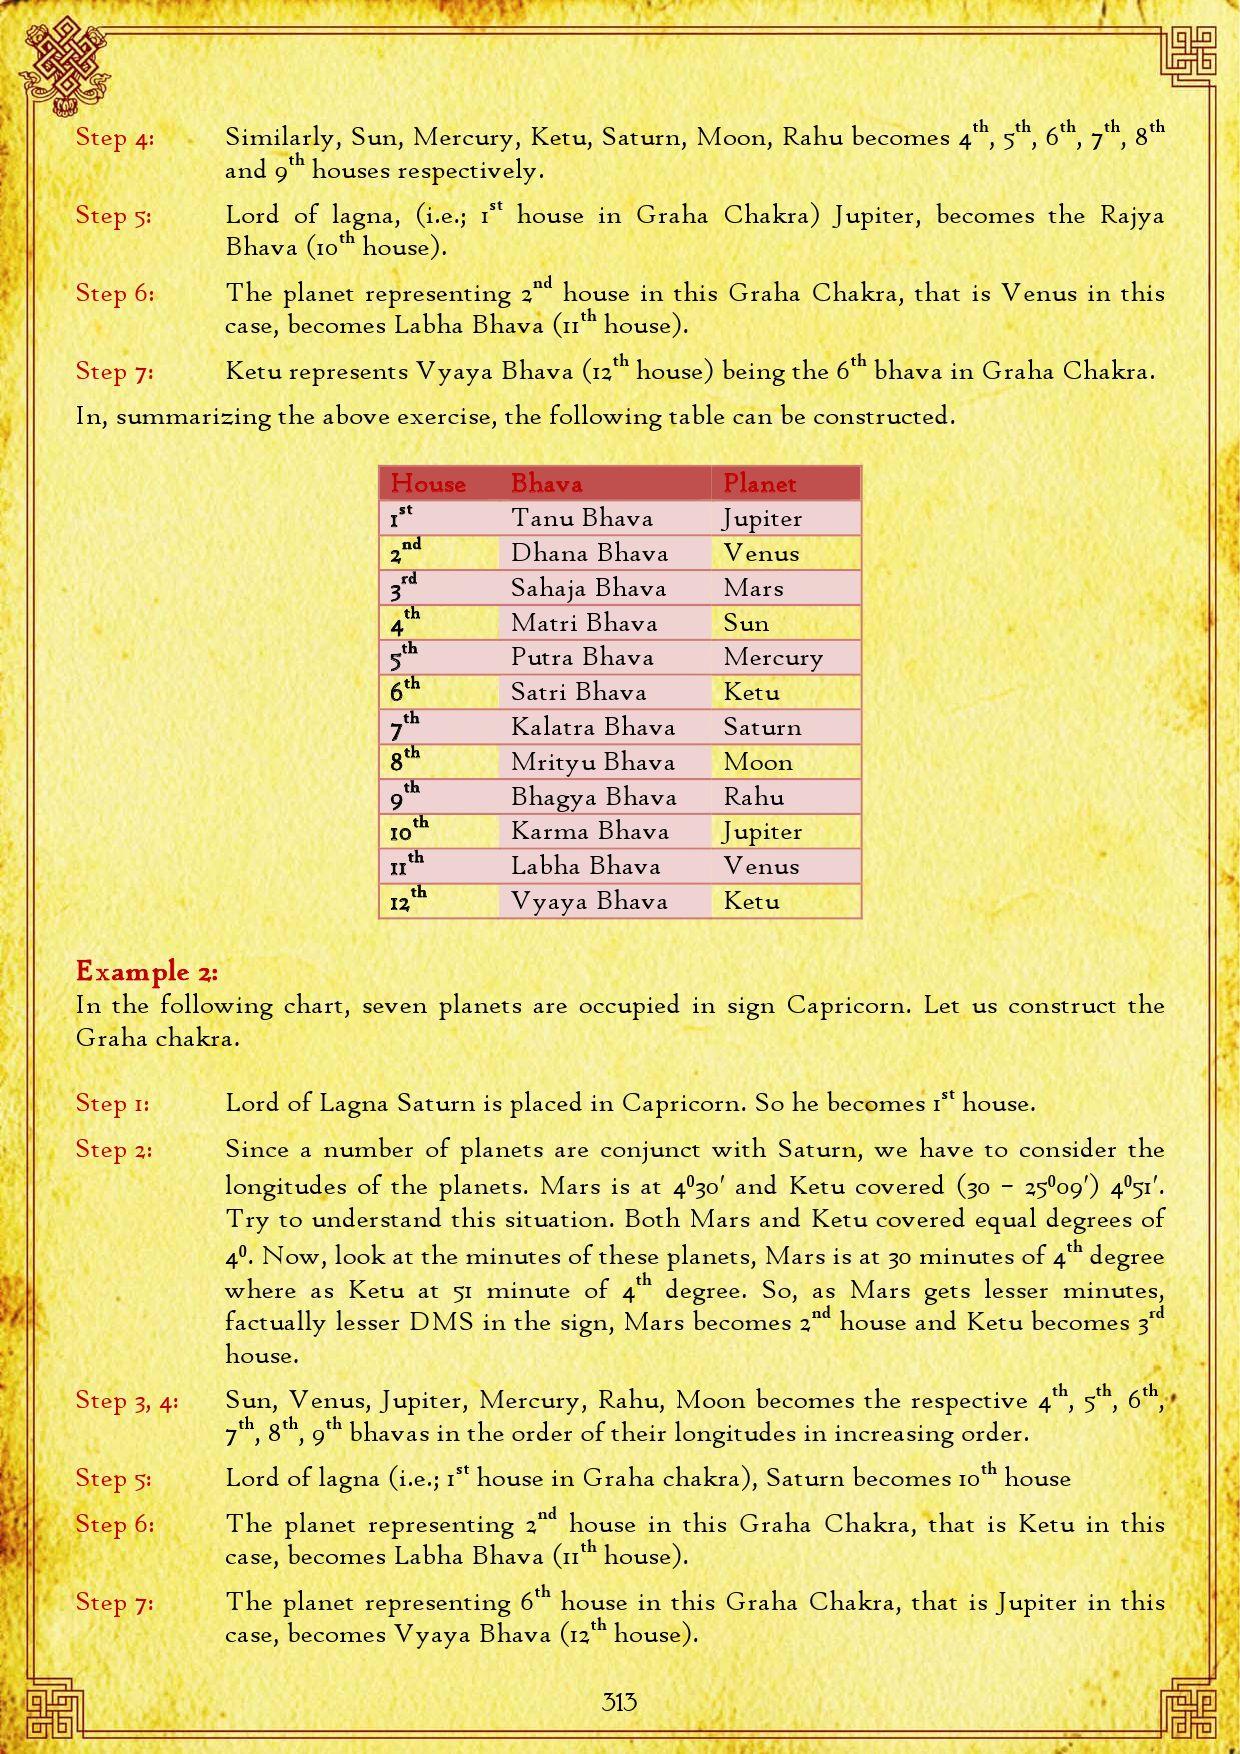 Microsoft Word - 31-Graha Chakra by Saptarishis Astrology